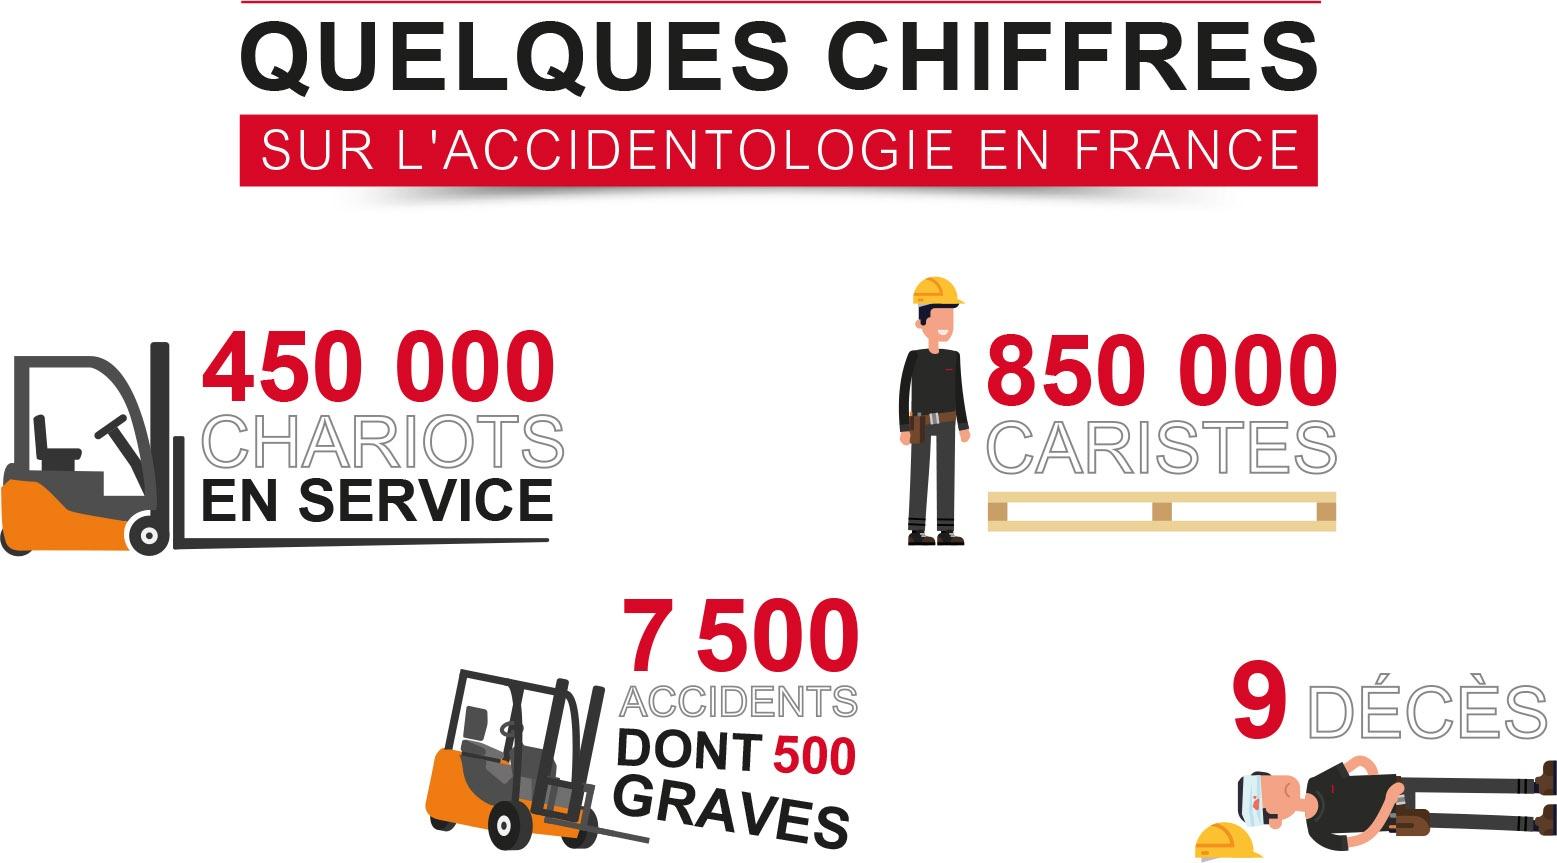 Infographie chiffres accidentologie en France.jpg